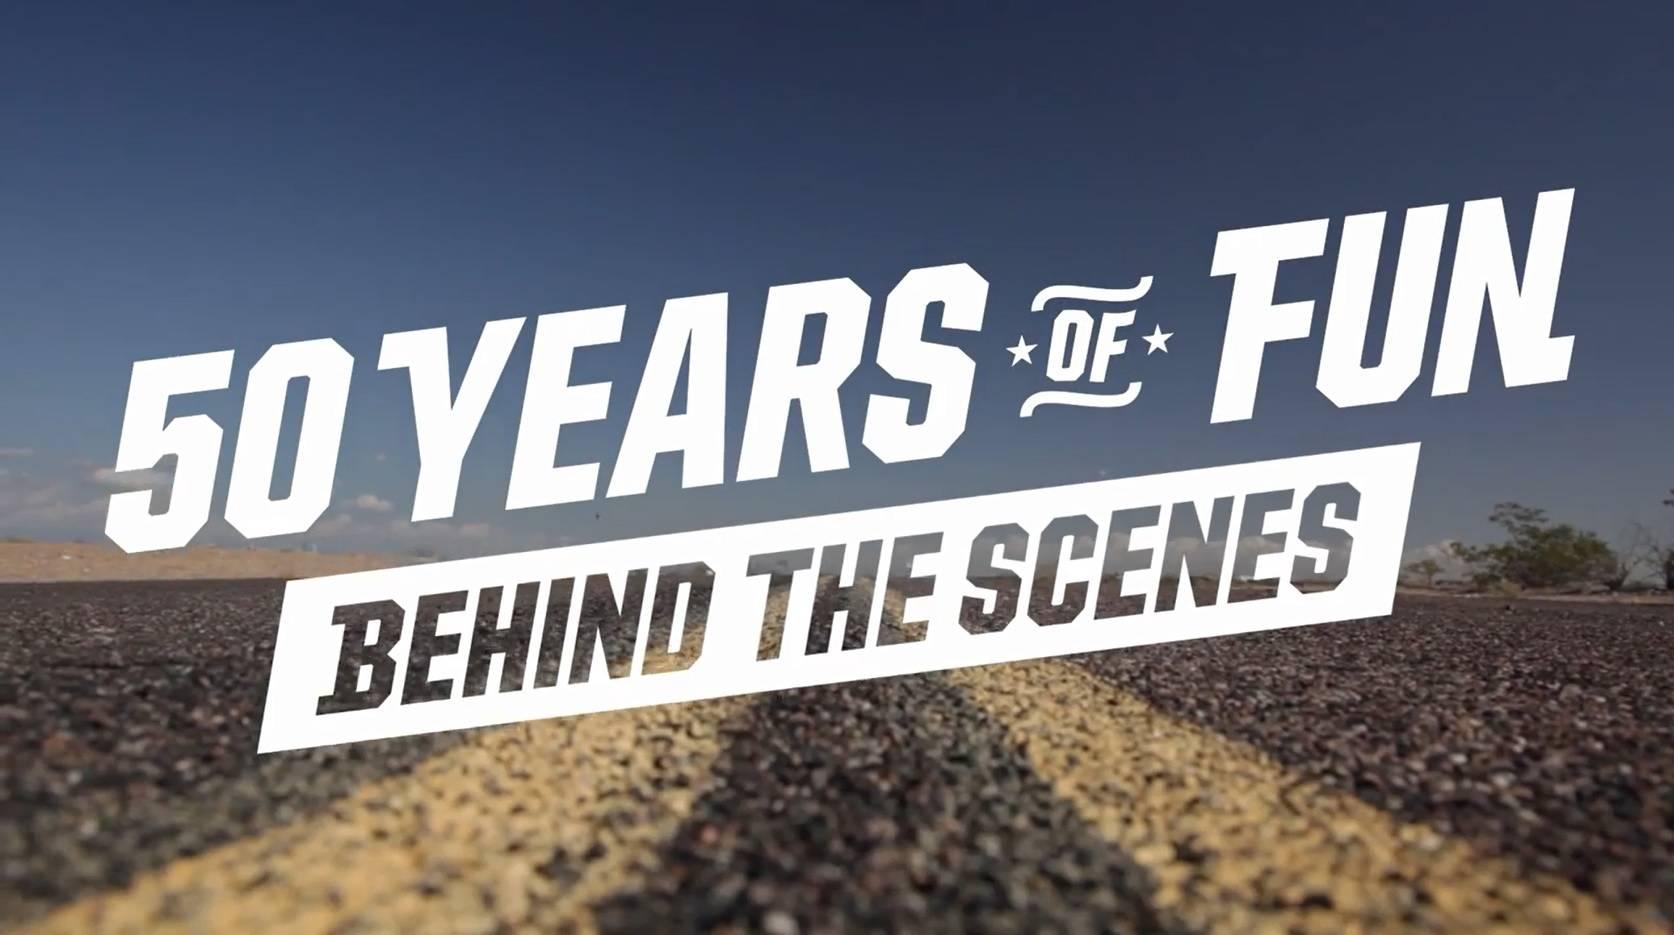 50 years BTS